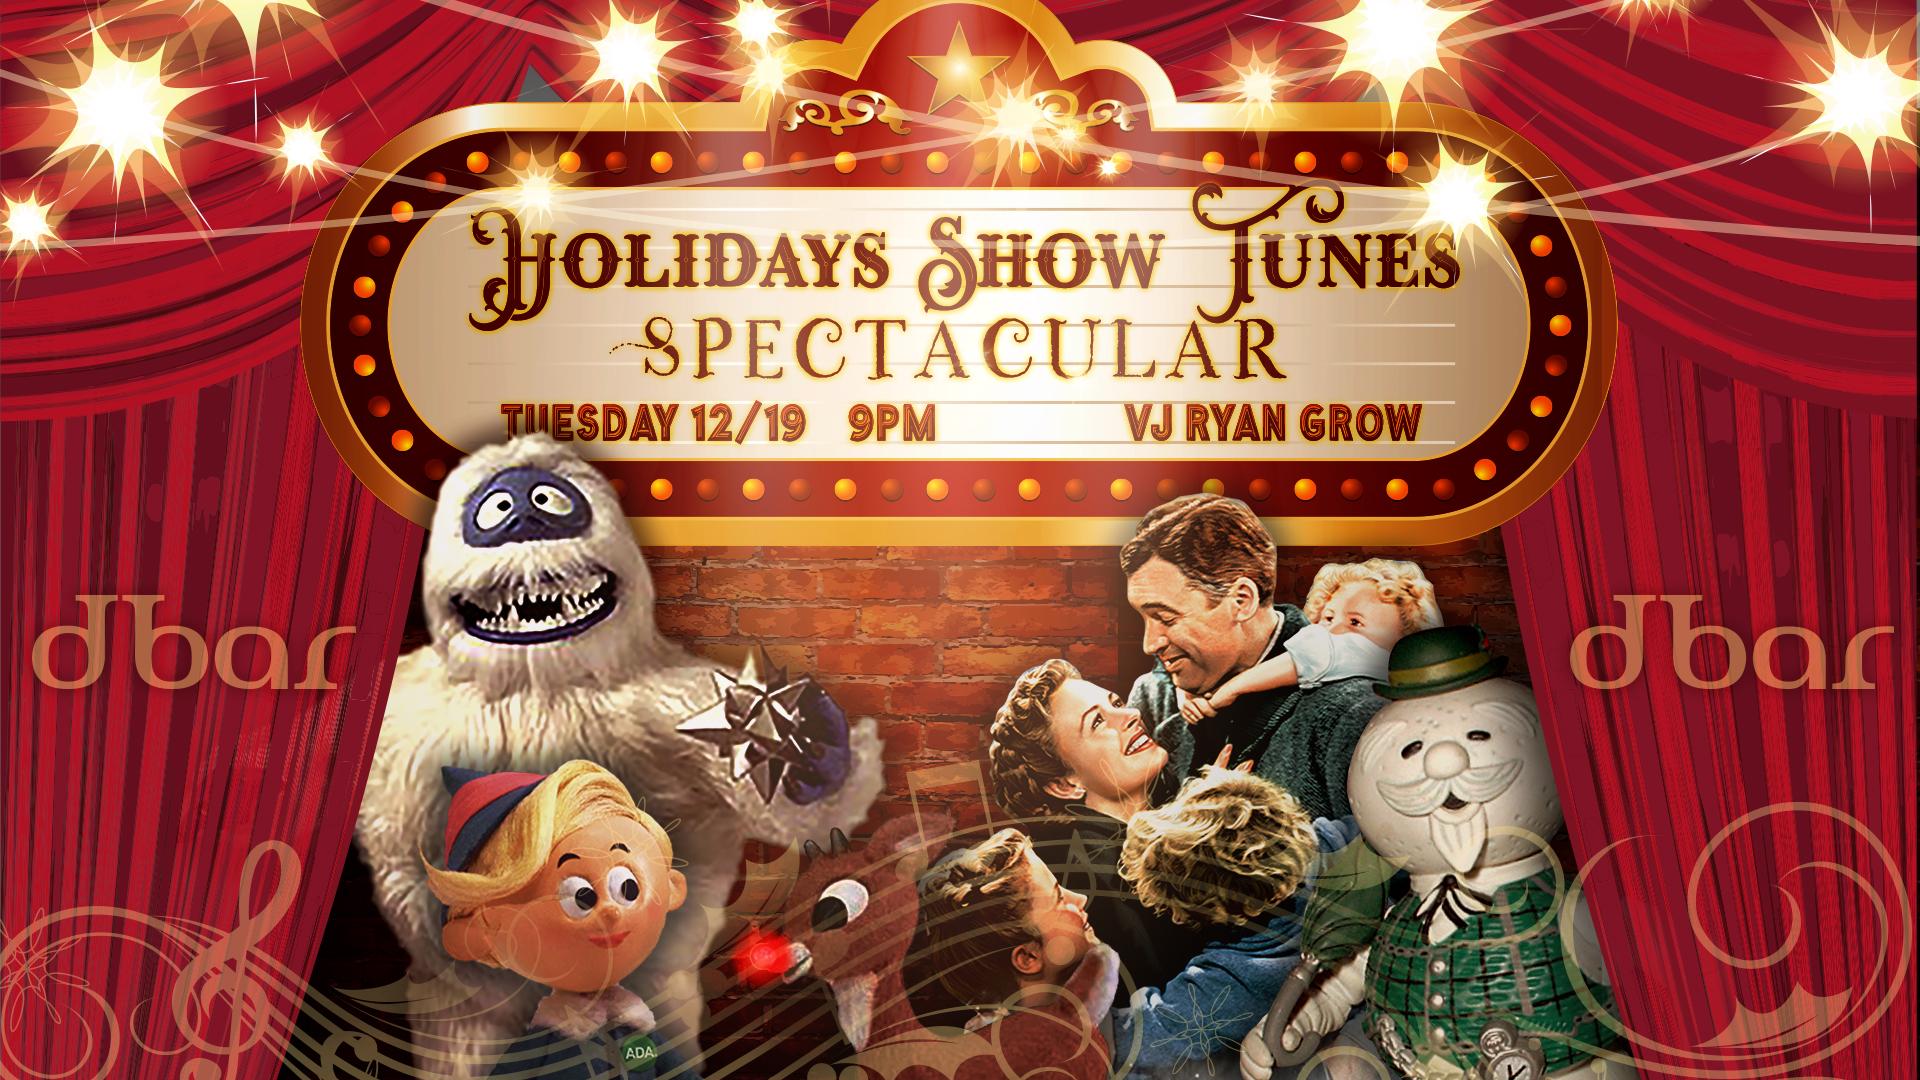 Show Tunes Holiday Spectacular FB.jpg